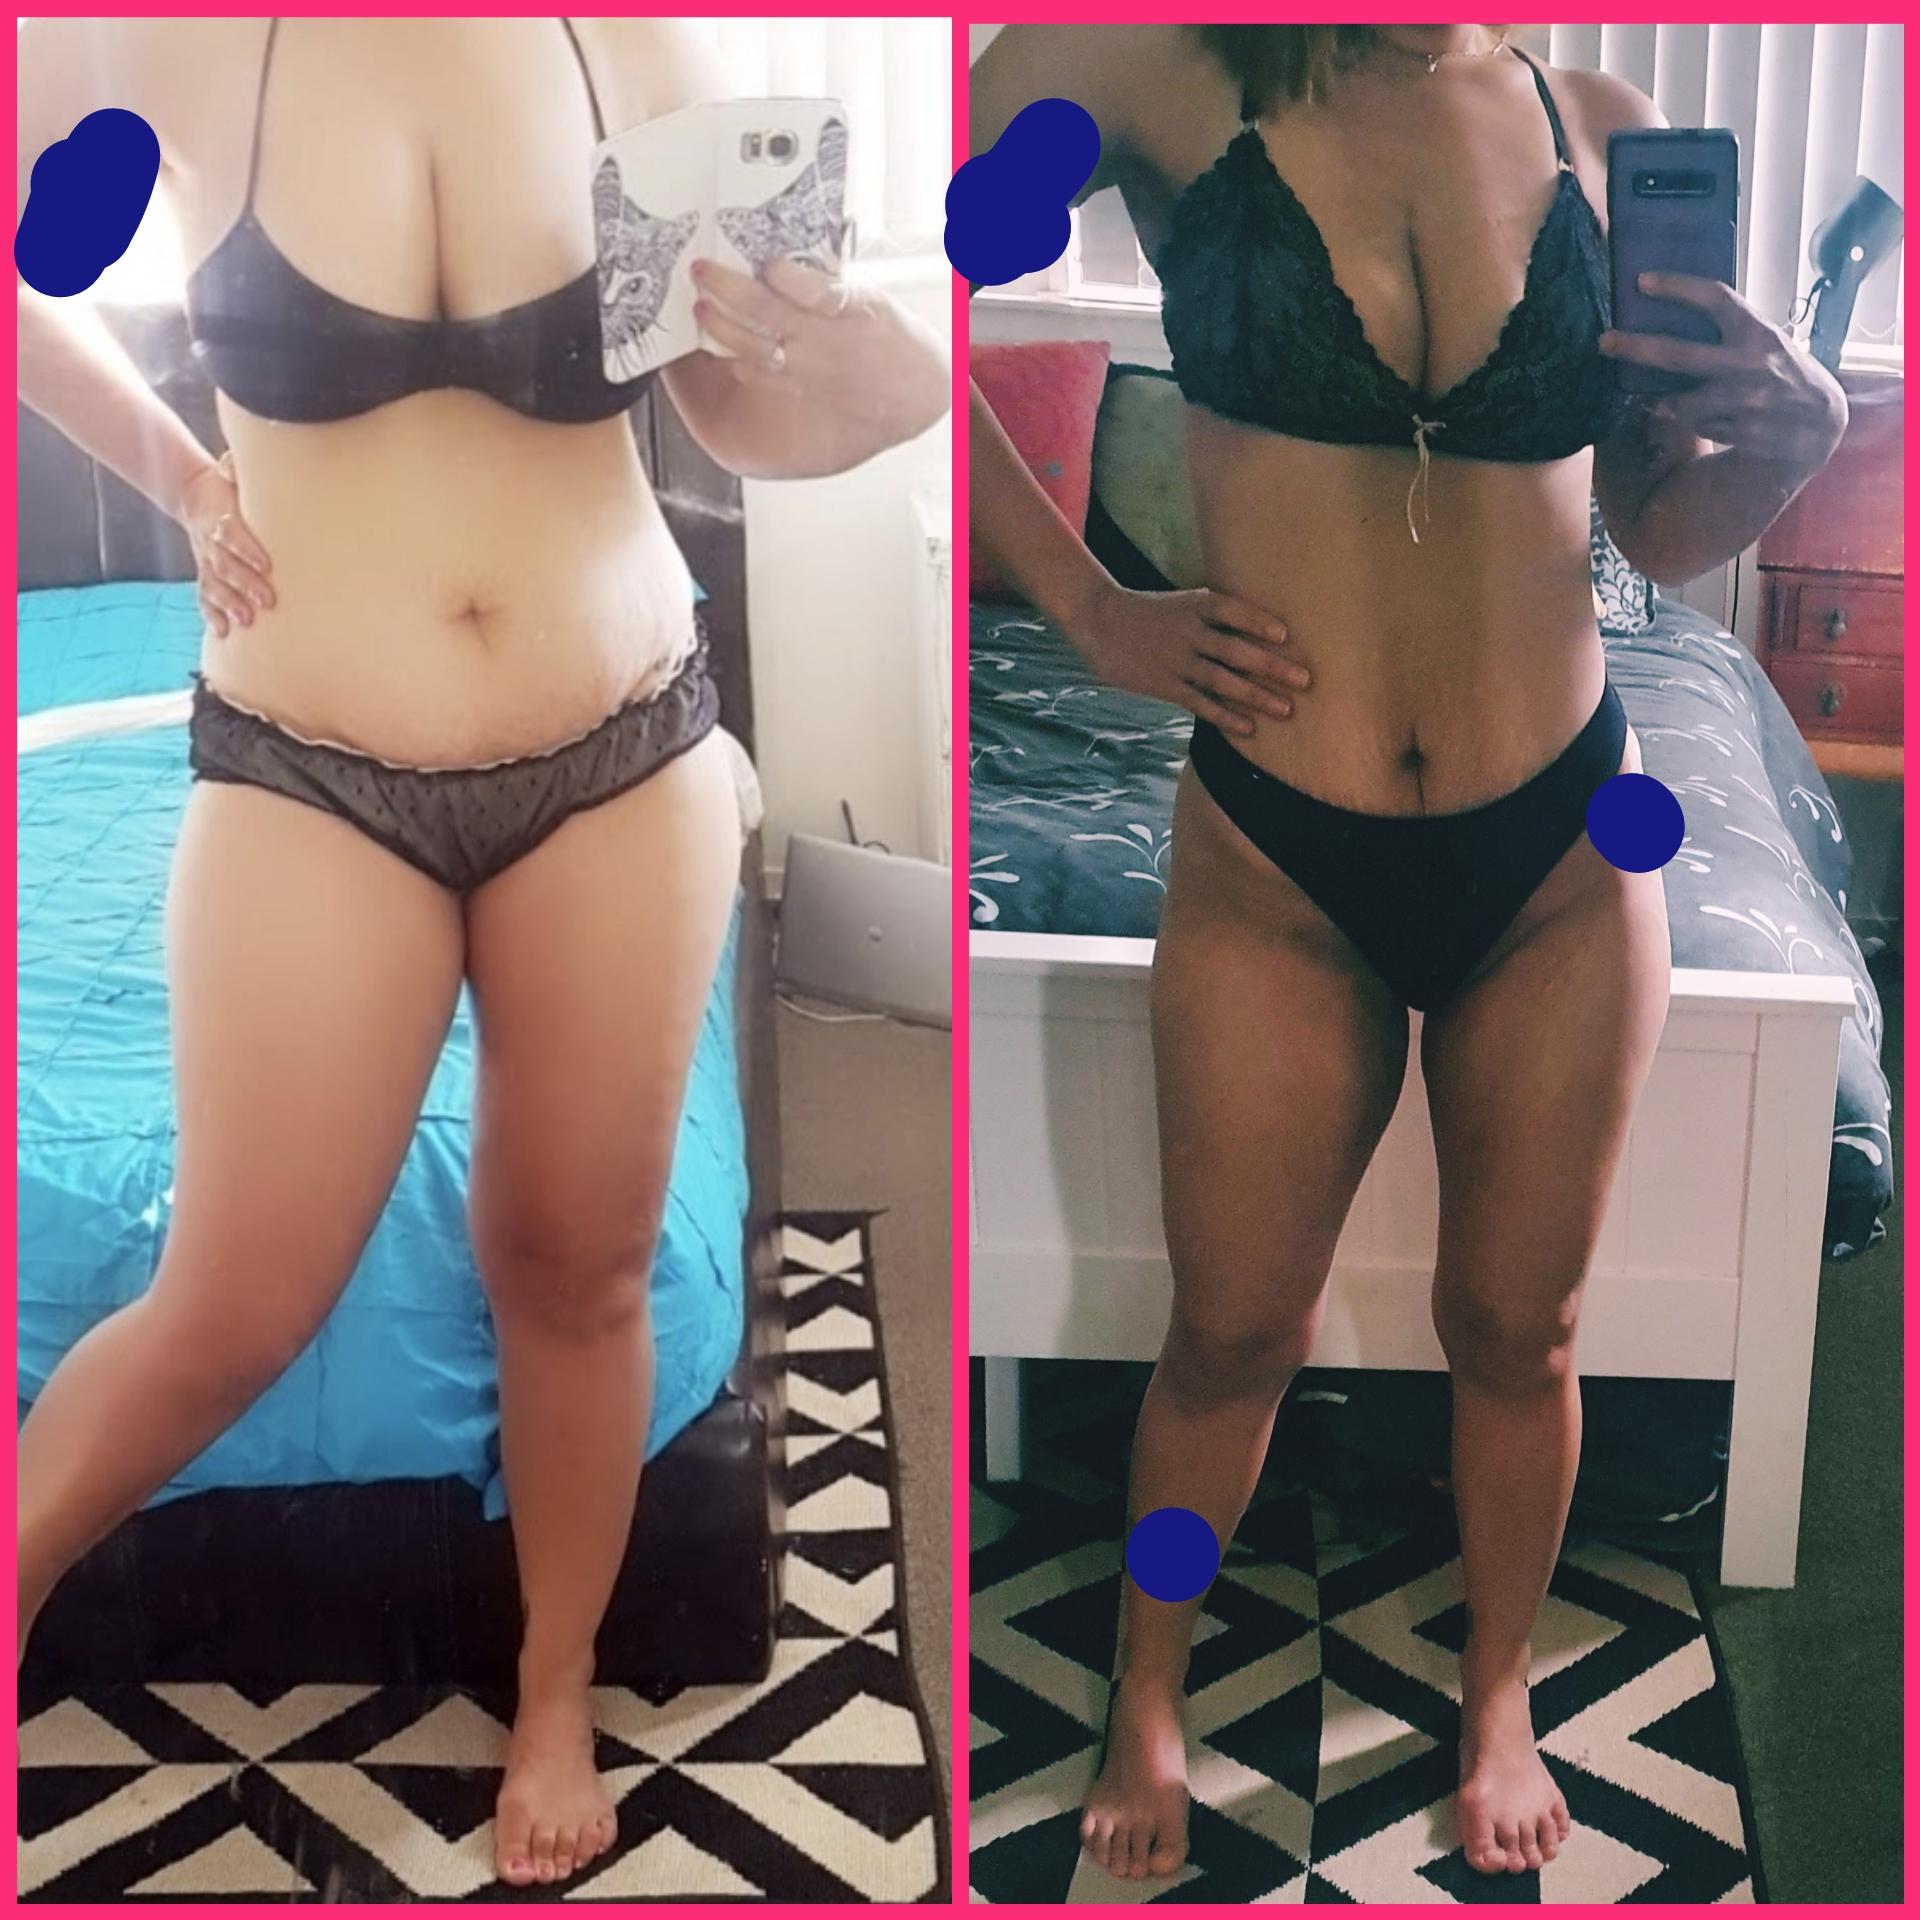 75 lbs Weight Loss 5'5 Female 200 lbs to 125 lbs